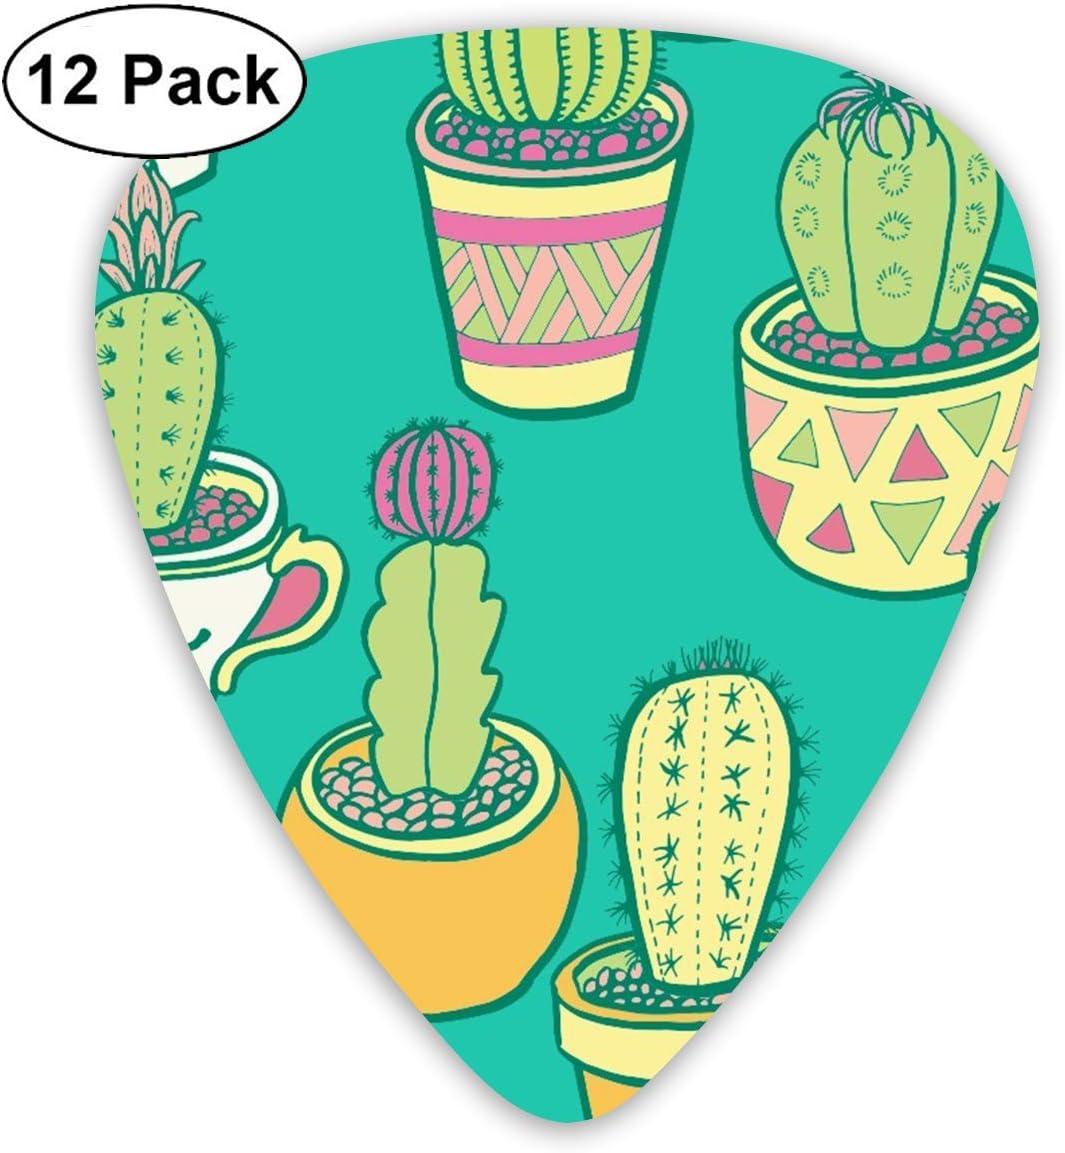 12 Pack Guitar Picks Cactus.png Think, Medium and Heavy,Unique ...